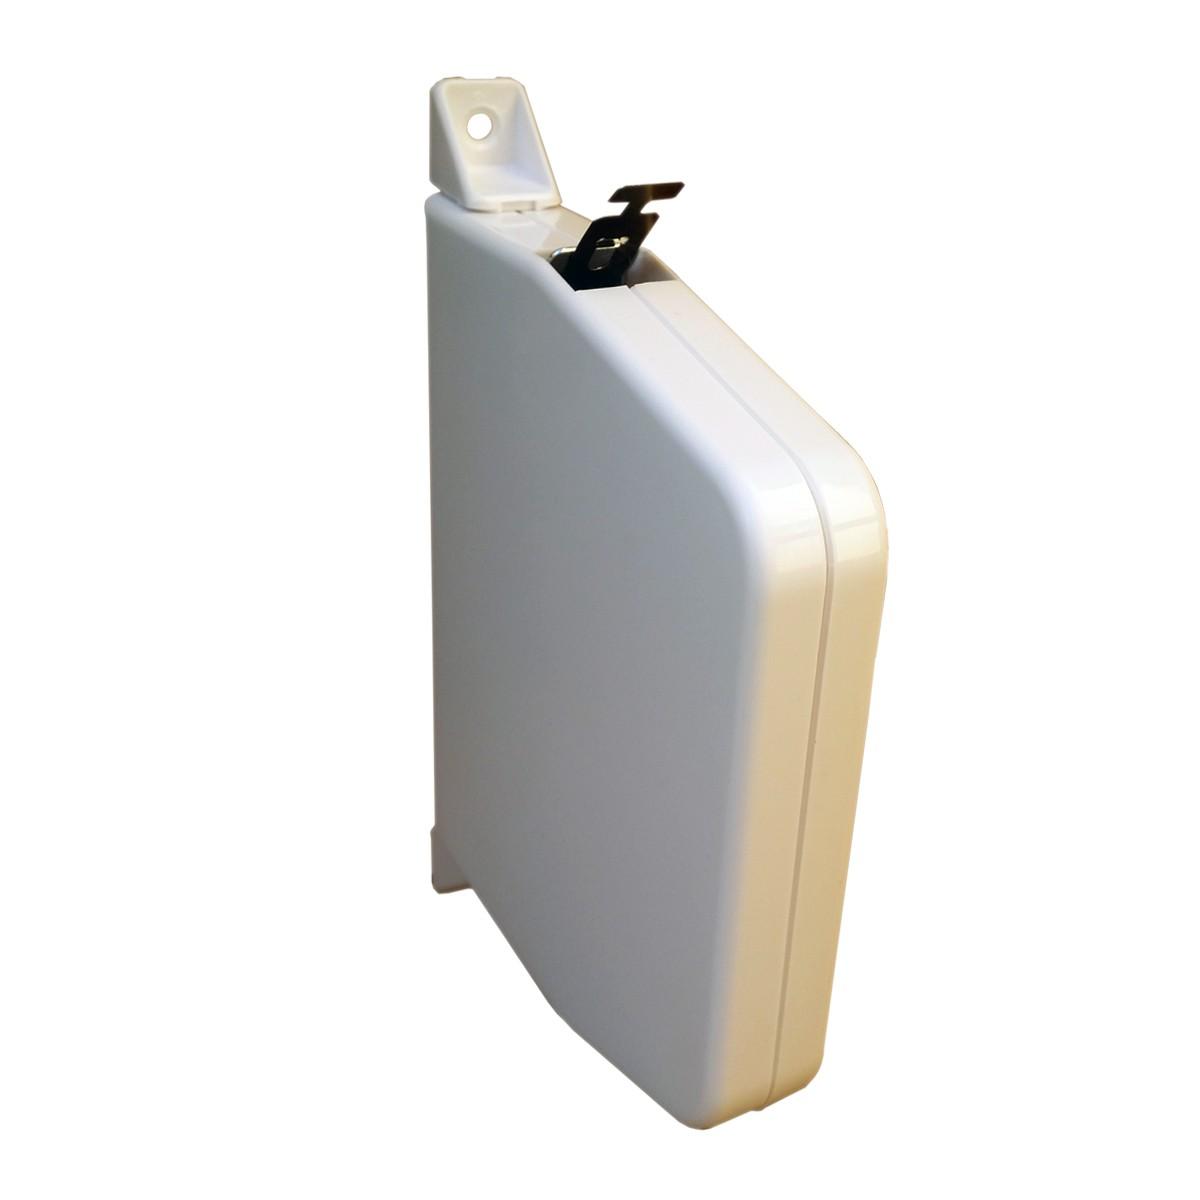 Minigurtroller